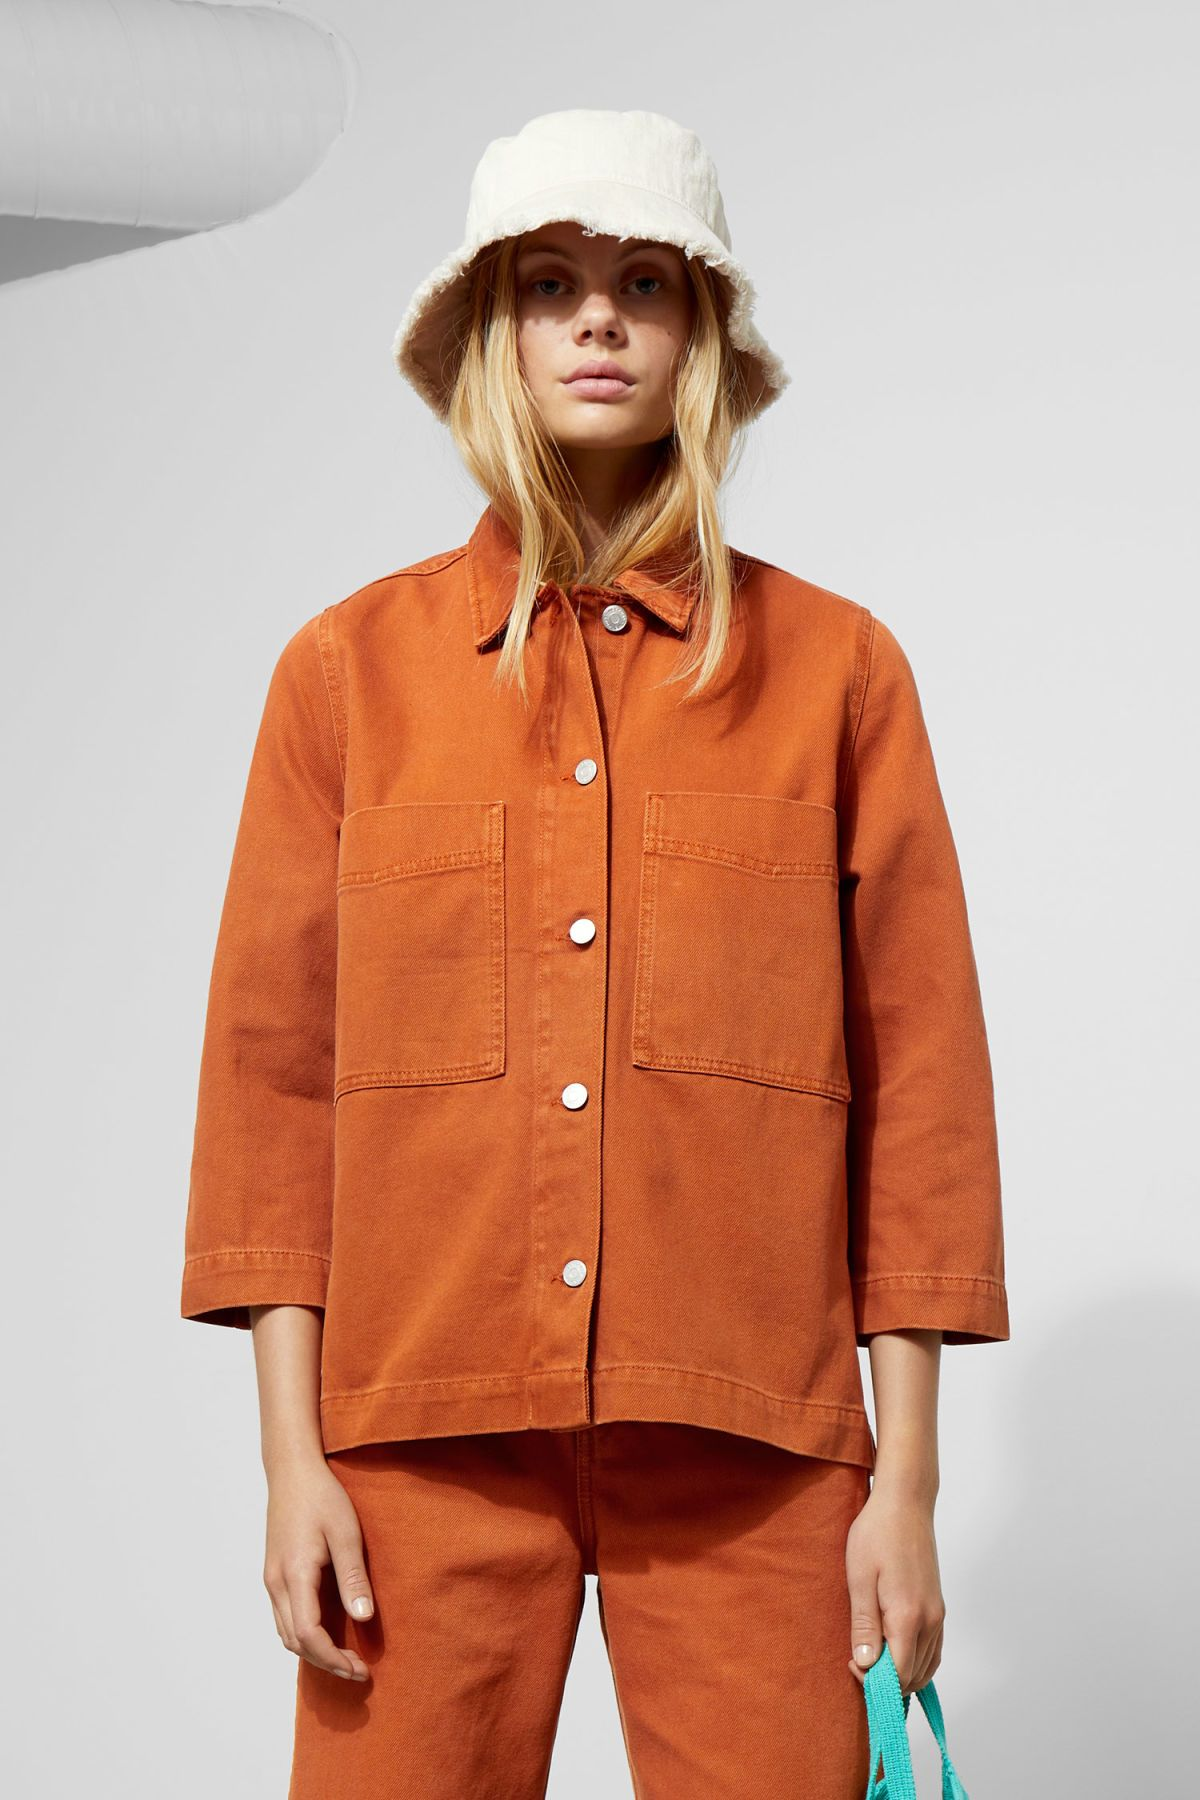 Coats for Women | Casual & Workwear